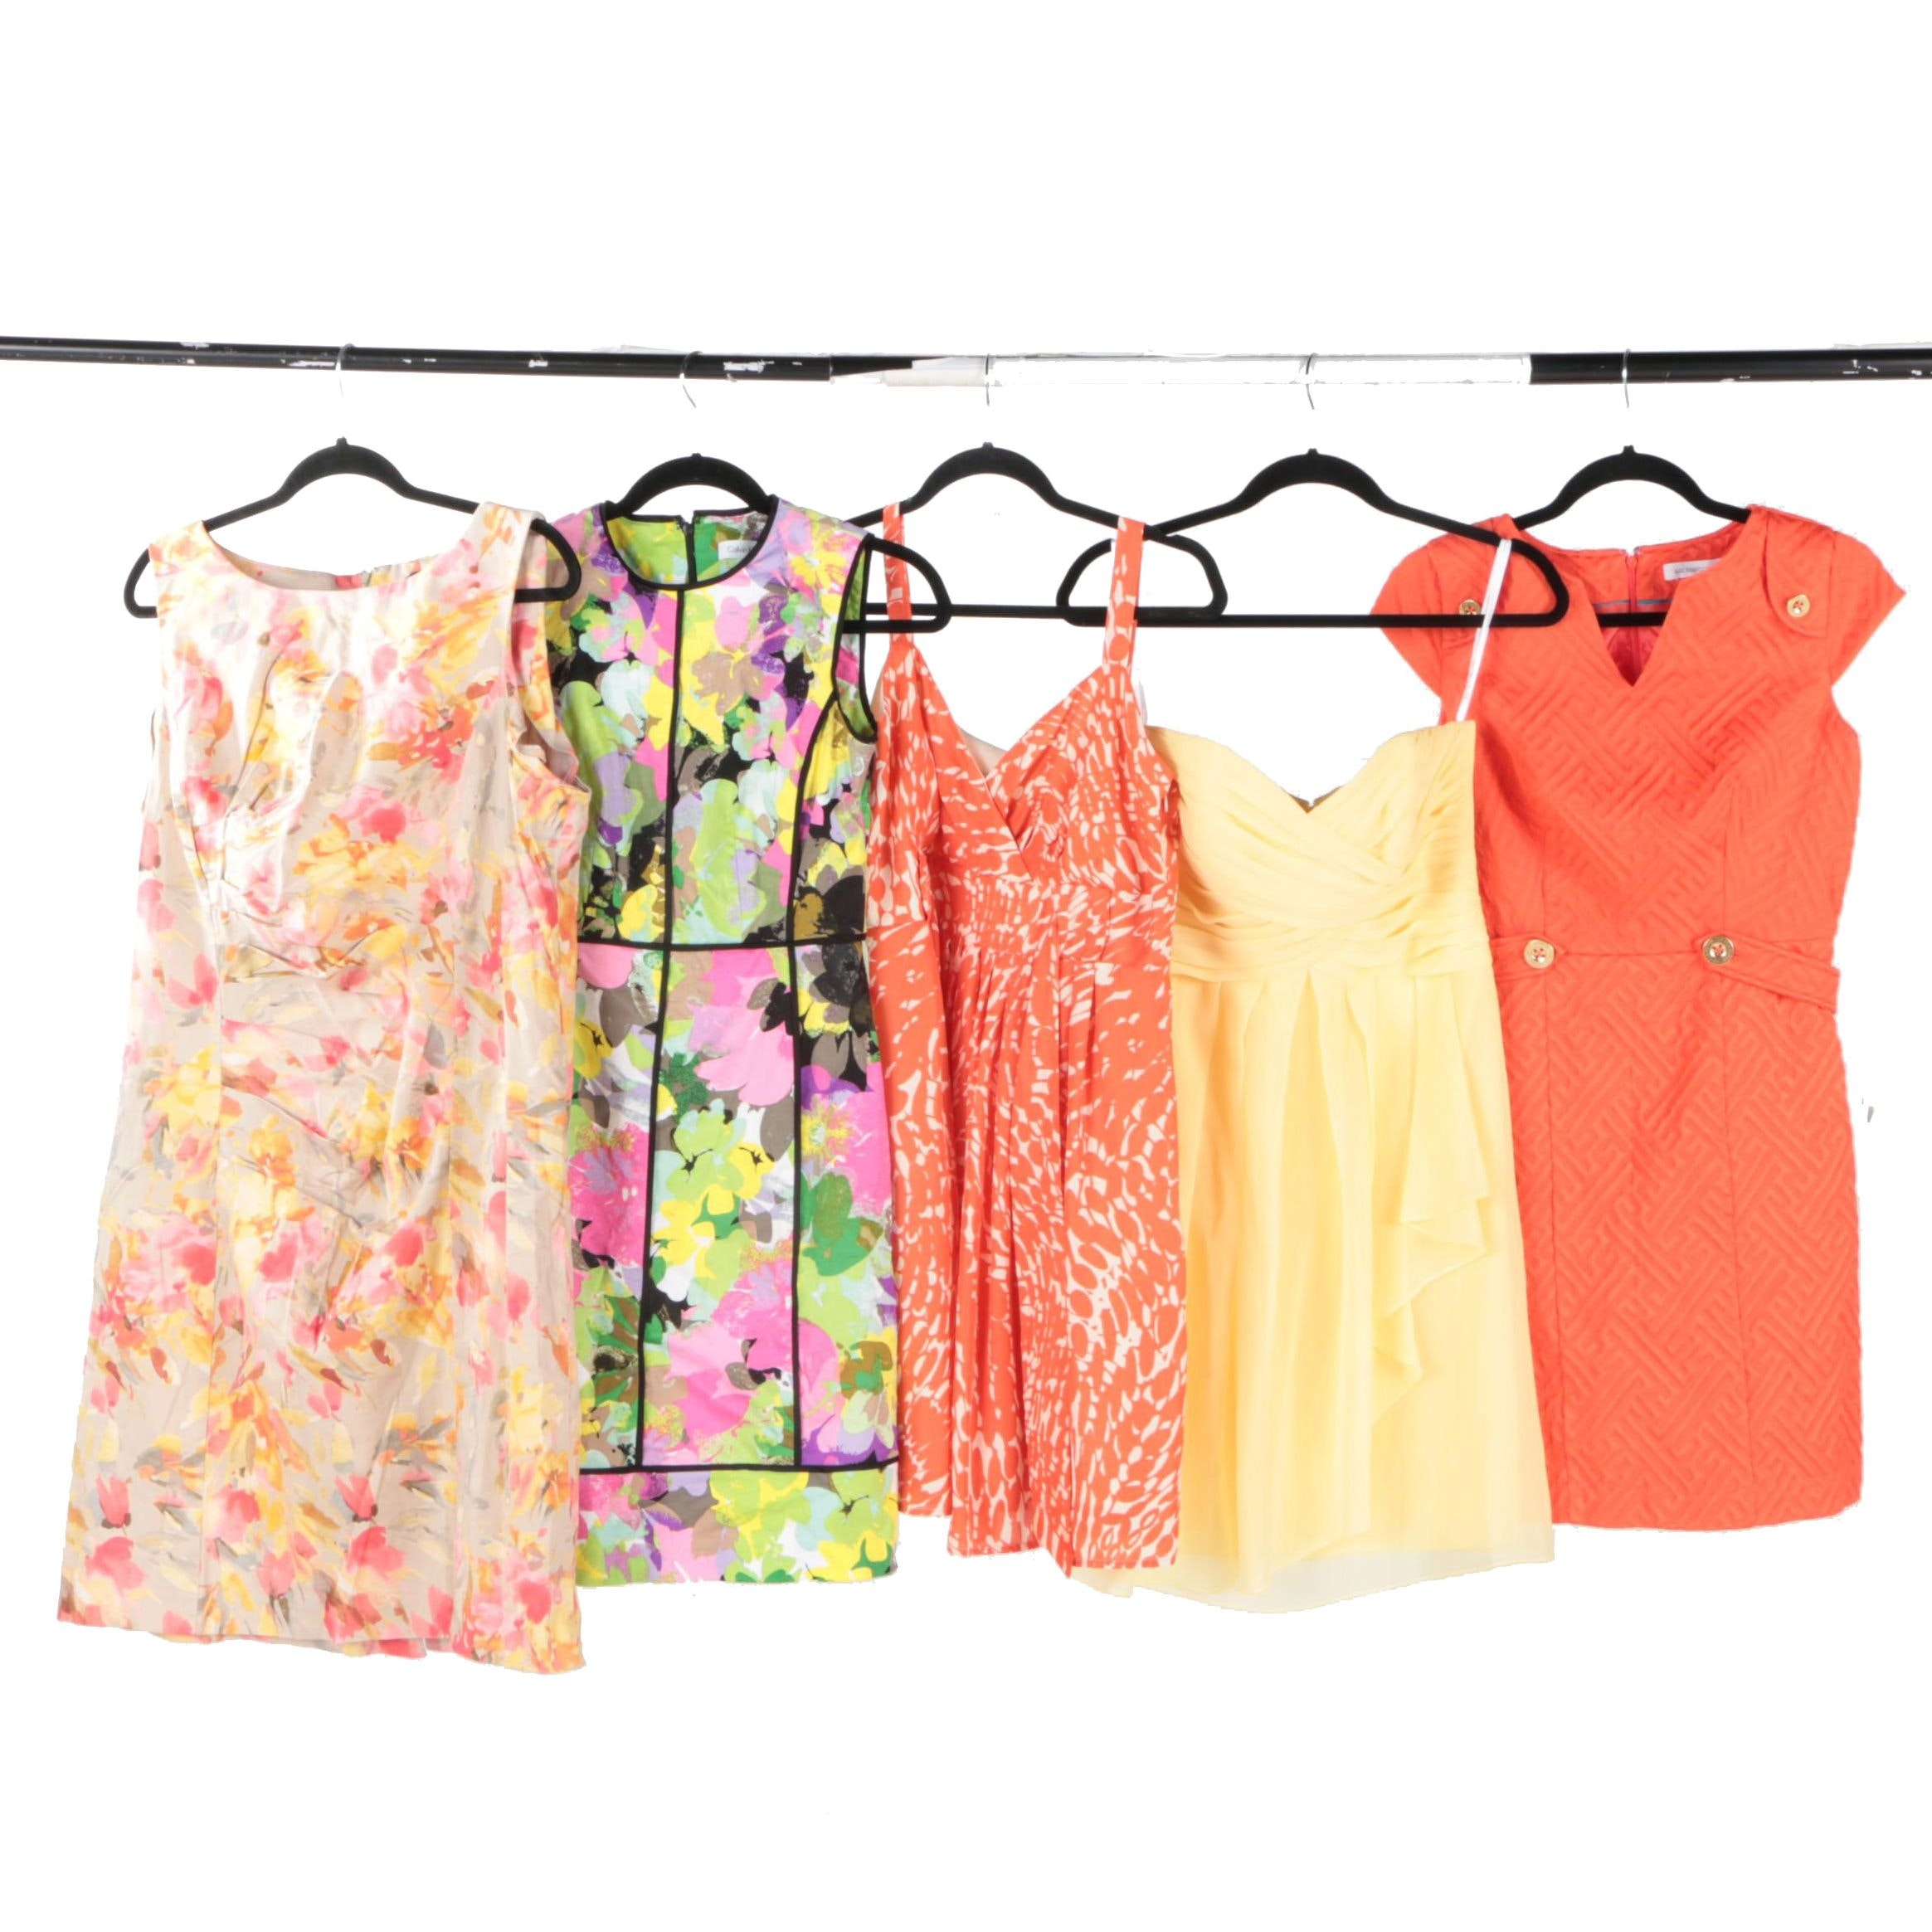 Women's Spring Dresses Including AK Anne Klein and Calvin Klein